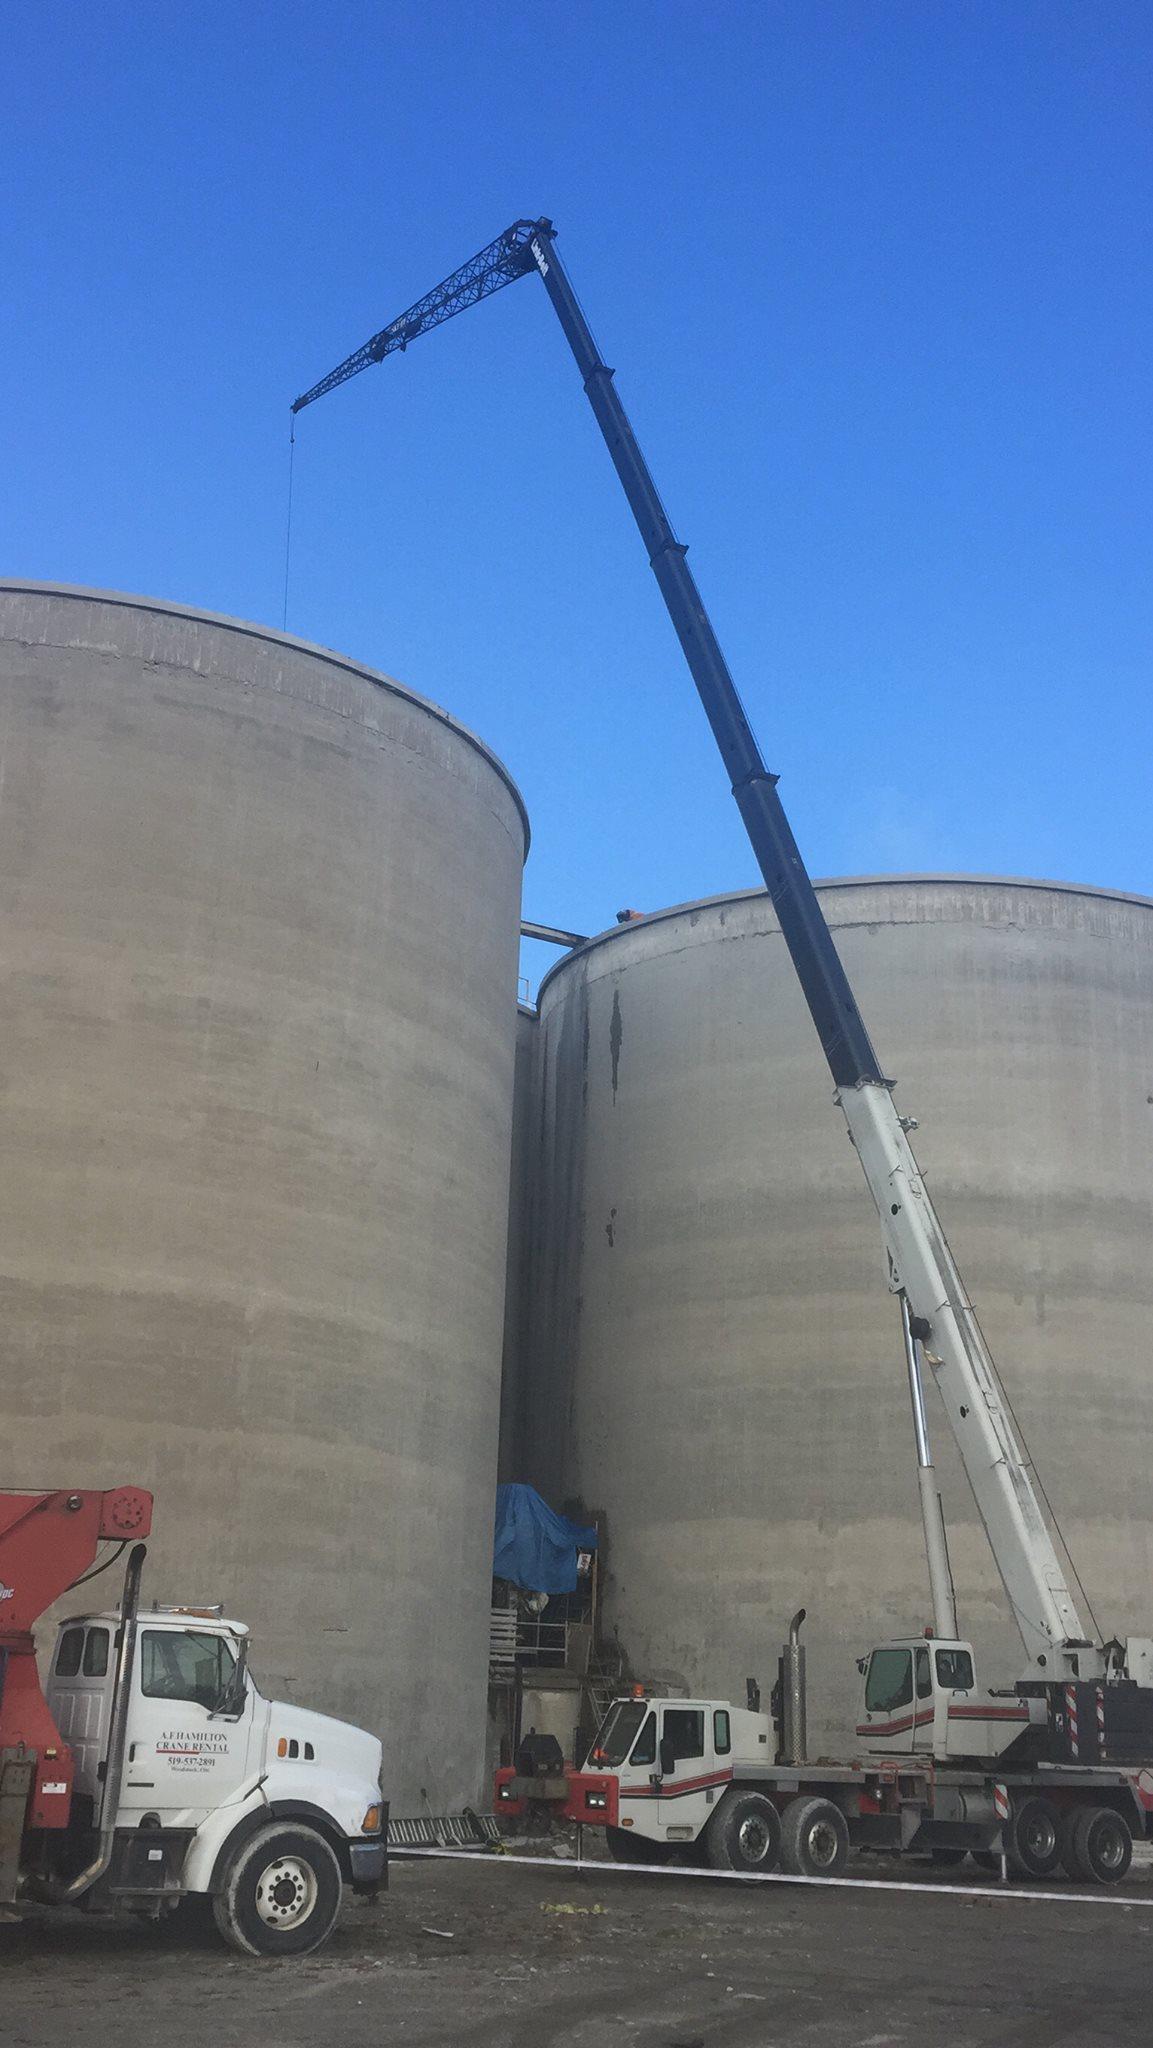 Mobile crane millwright job